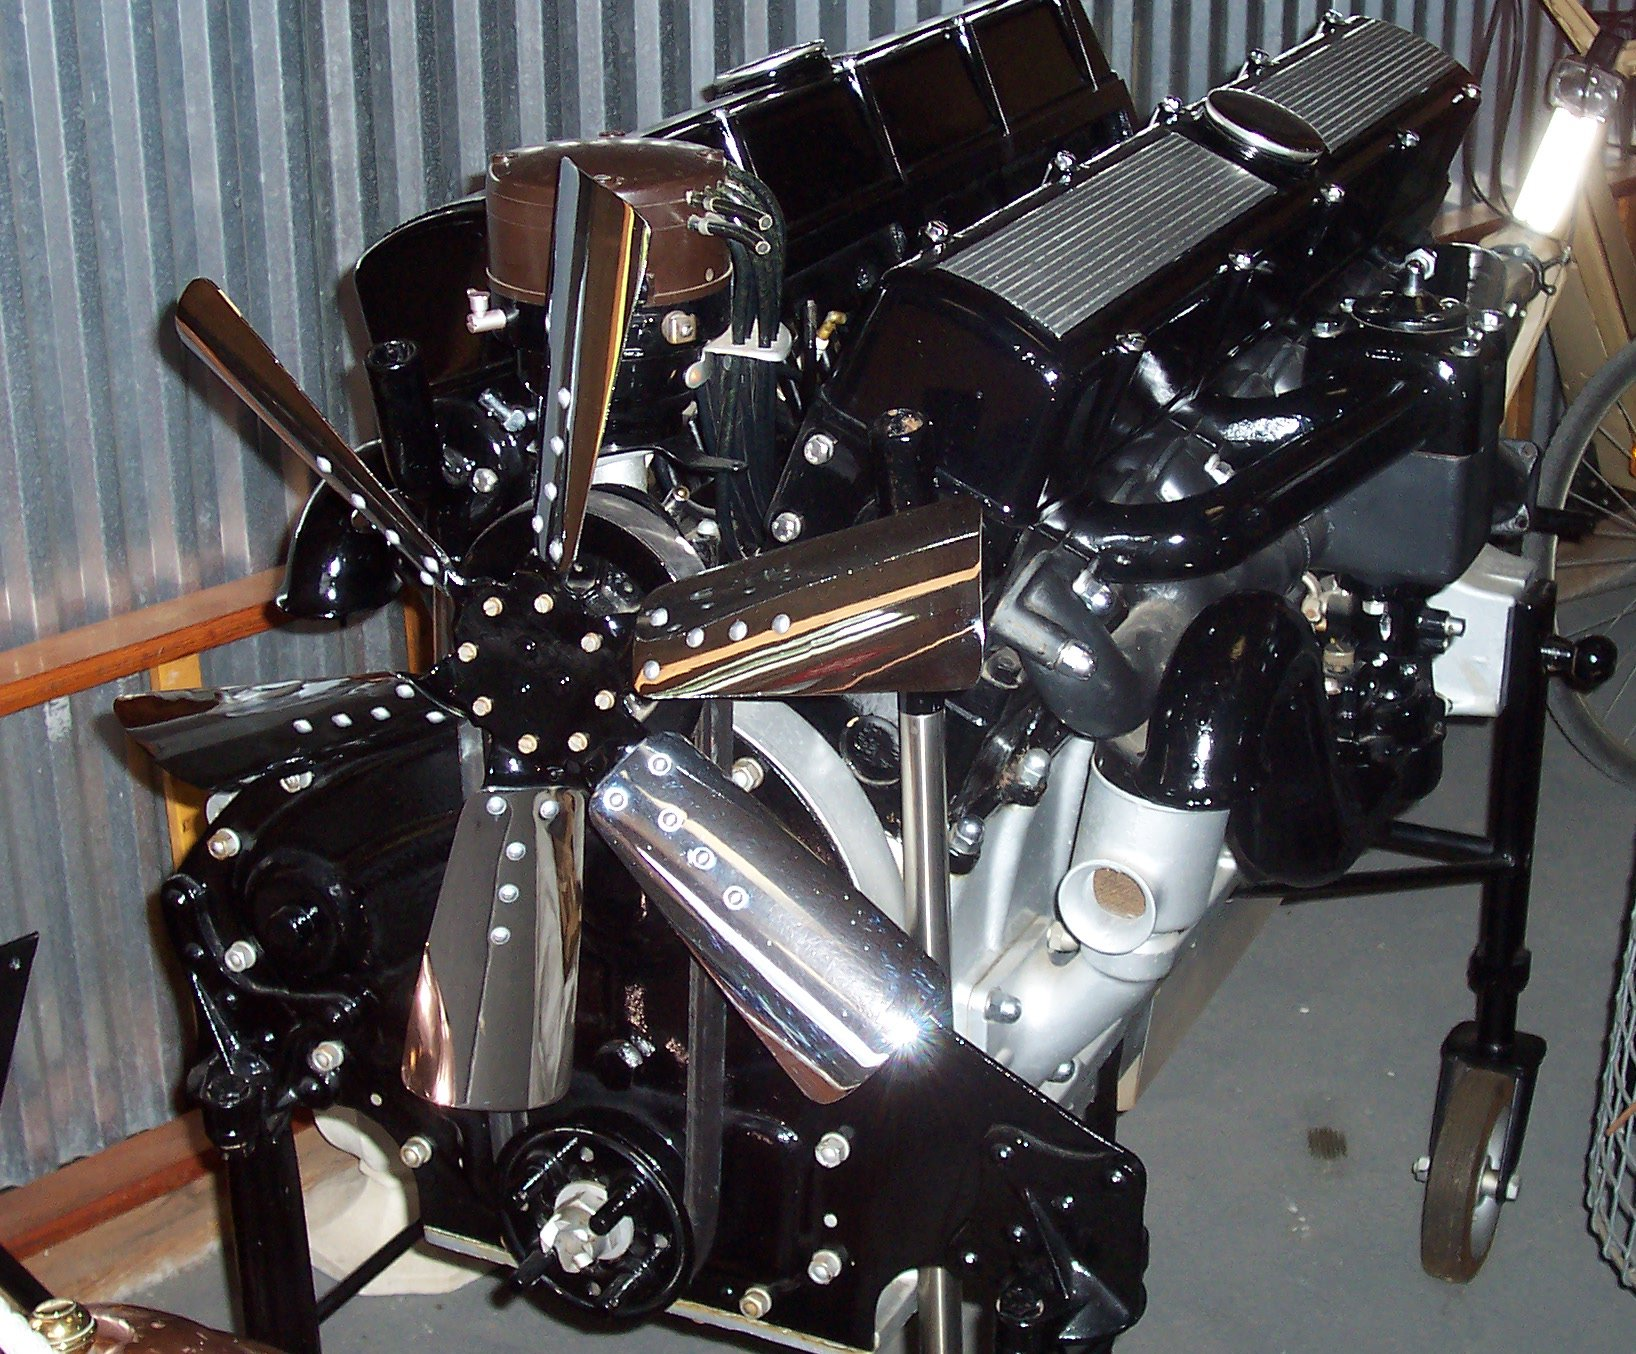 Cadillac V16 engine - Wikipedia